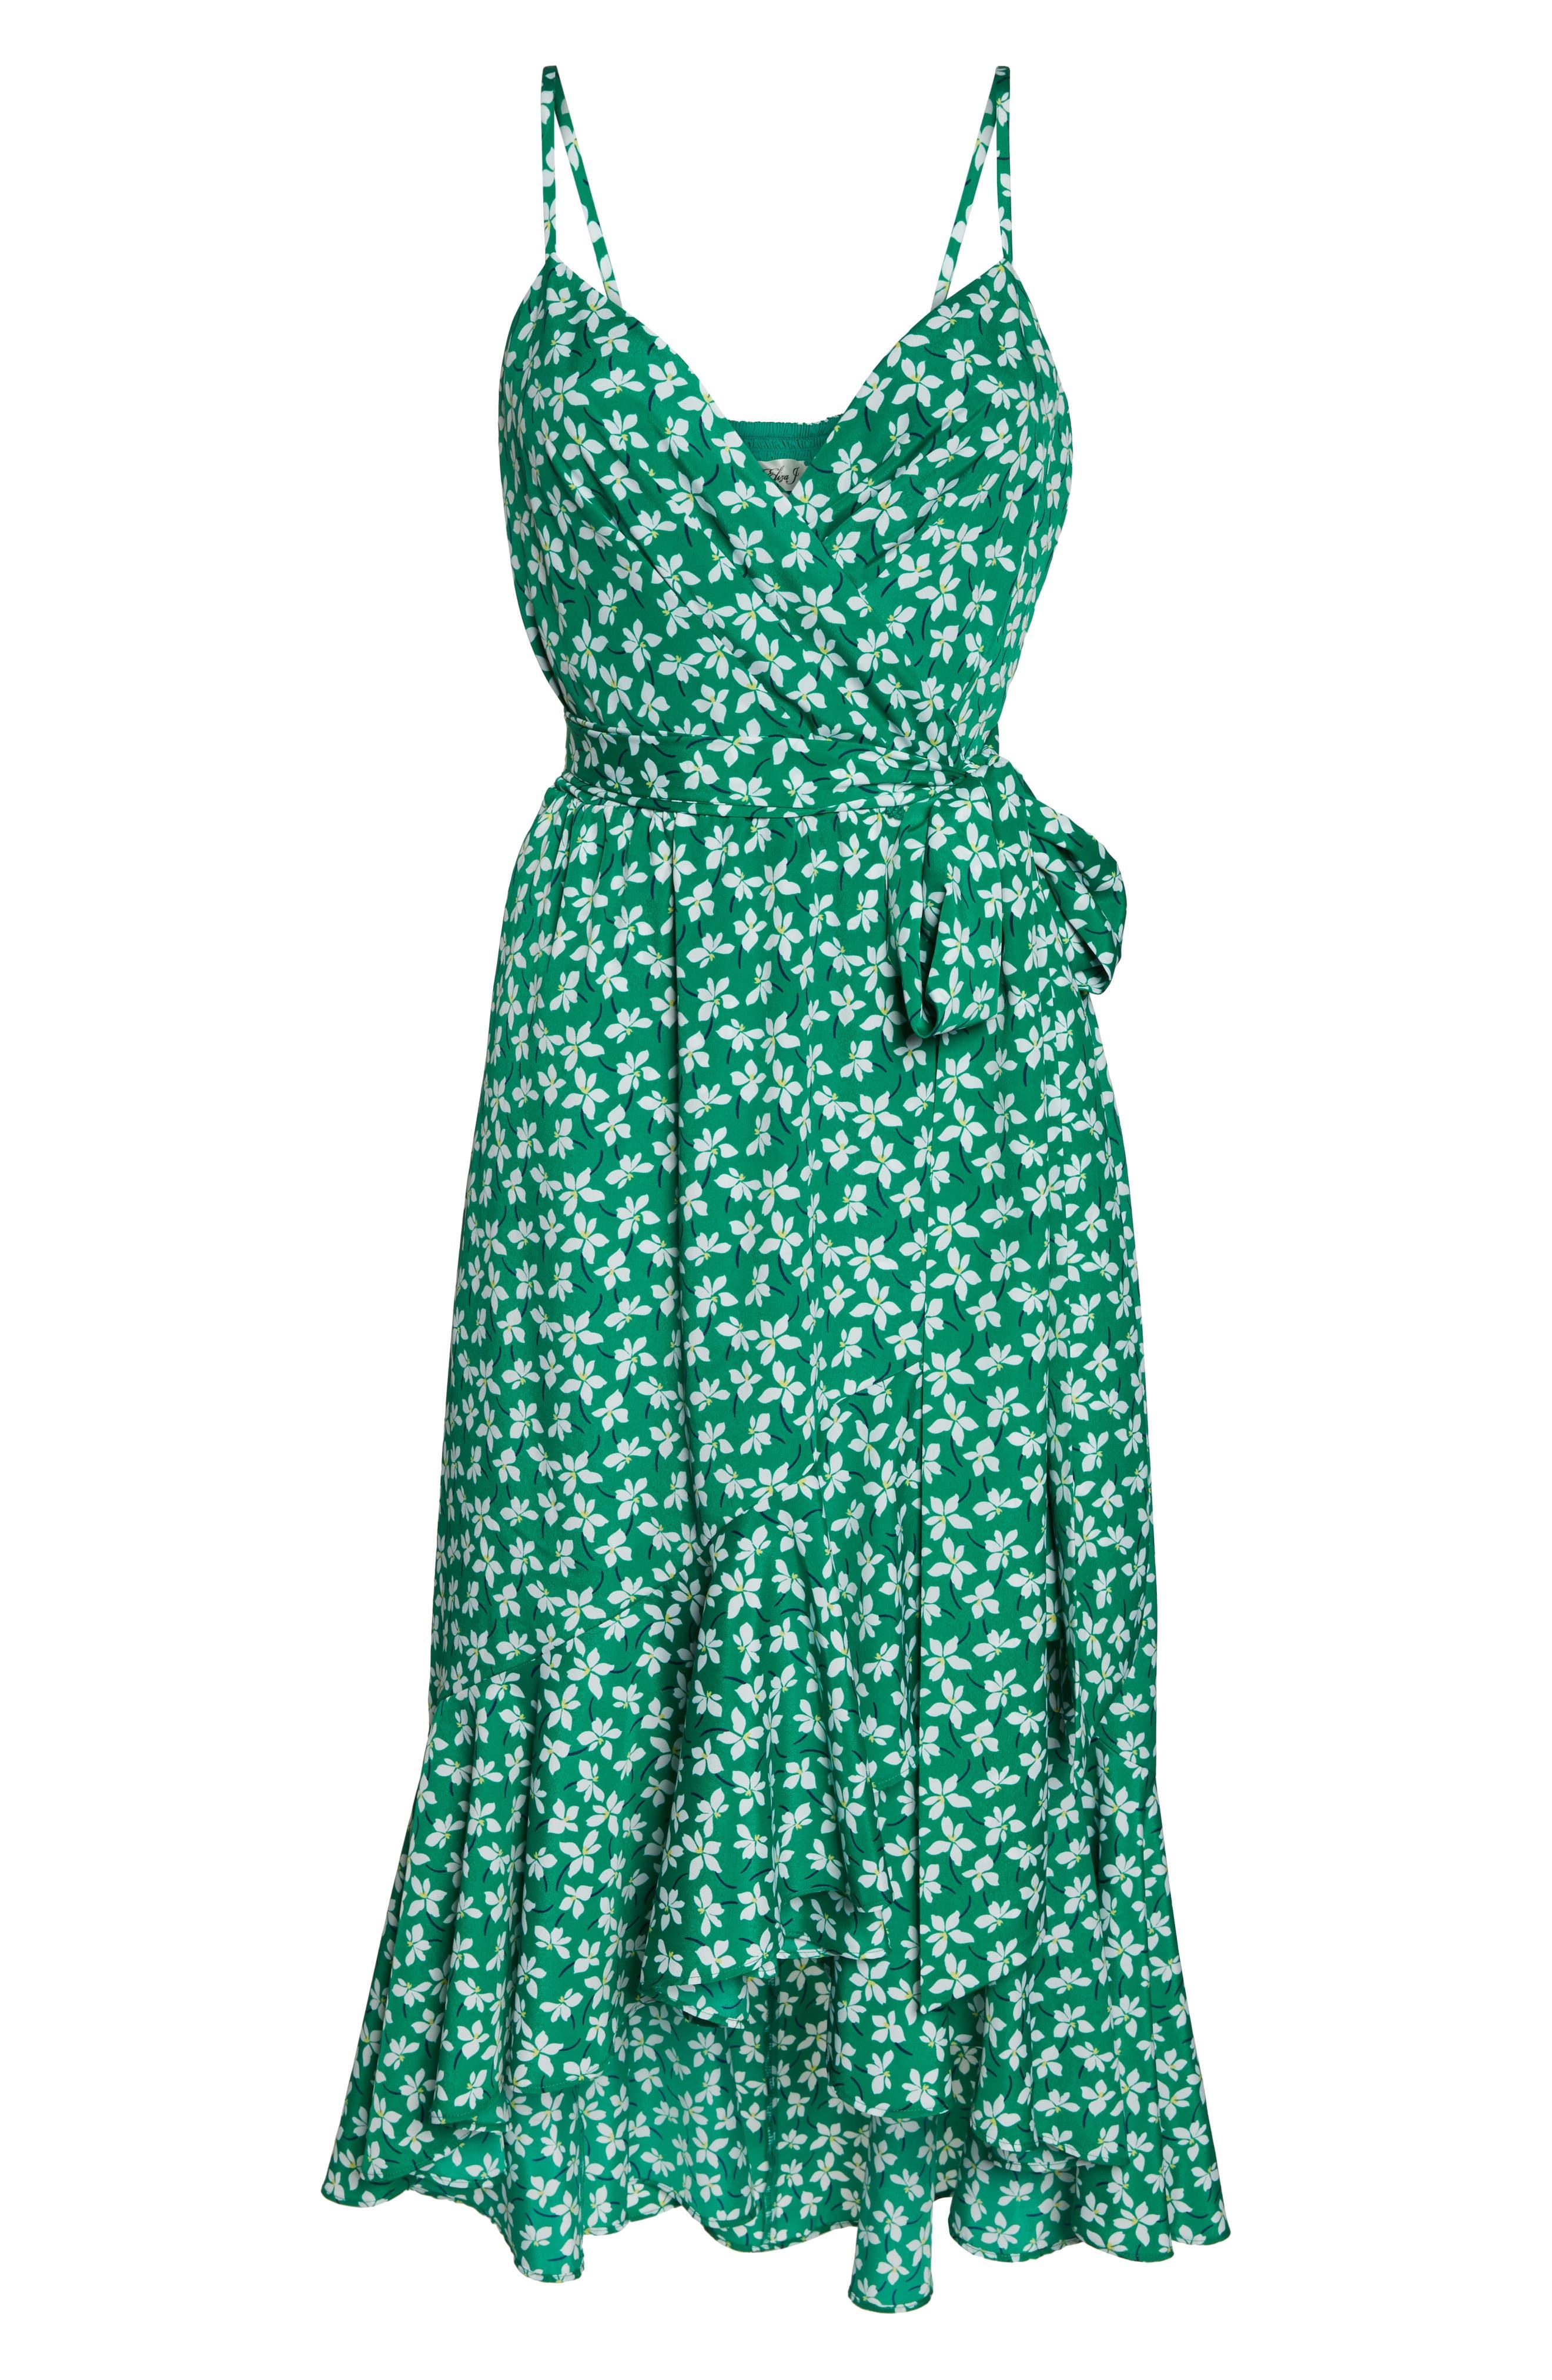 ELIZA J, Floral High/Low Faux Wrap Dress, Alternate thumbnail 7, color, GREEN